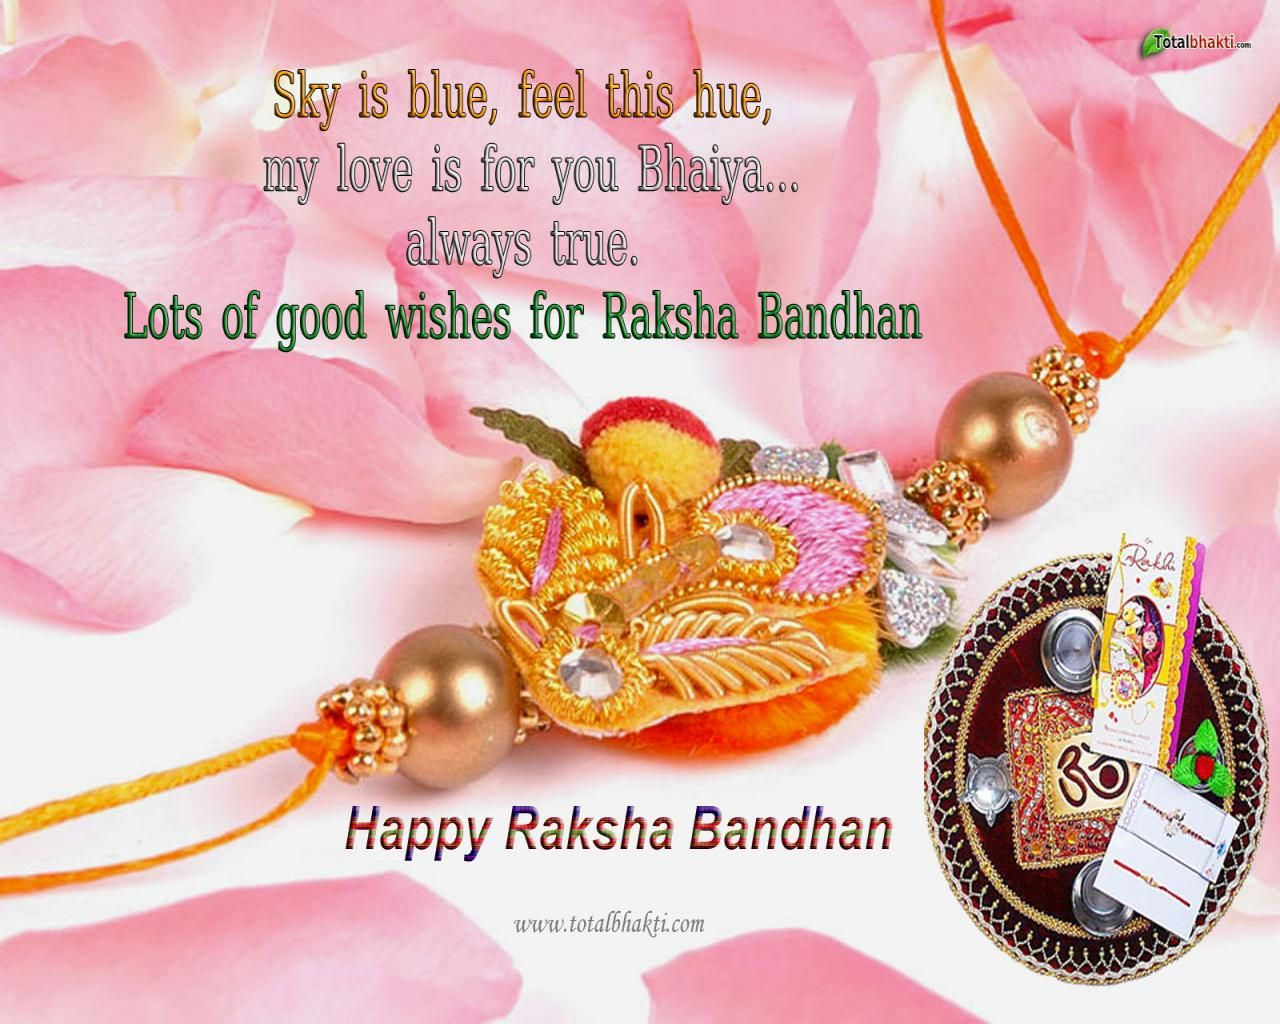 very short essay on raksha bandhan Raksha bandhan : essay, article, speech, paragraph, short note essay on raksha bandhan india is a country full of colors, cultural richness and festivals.